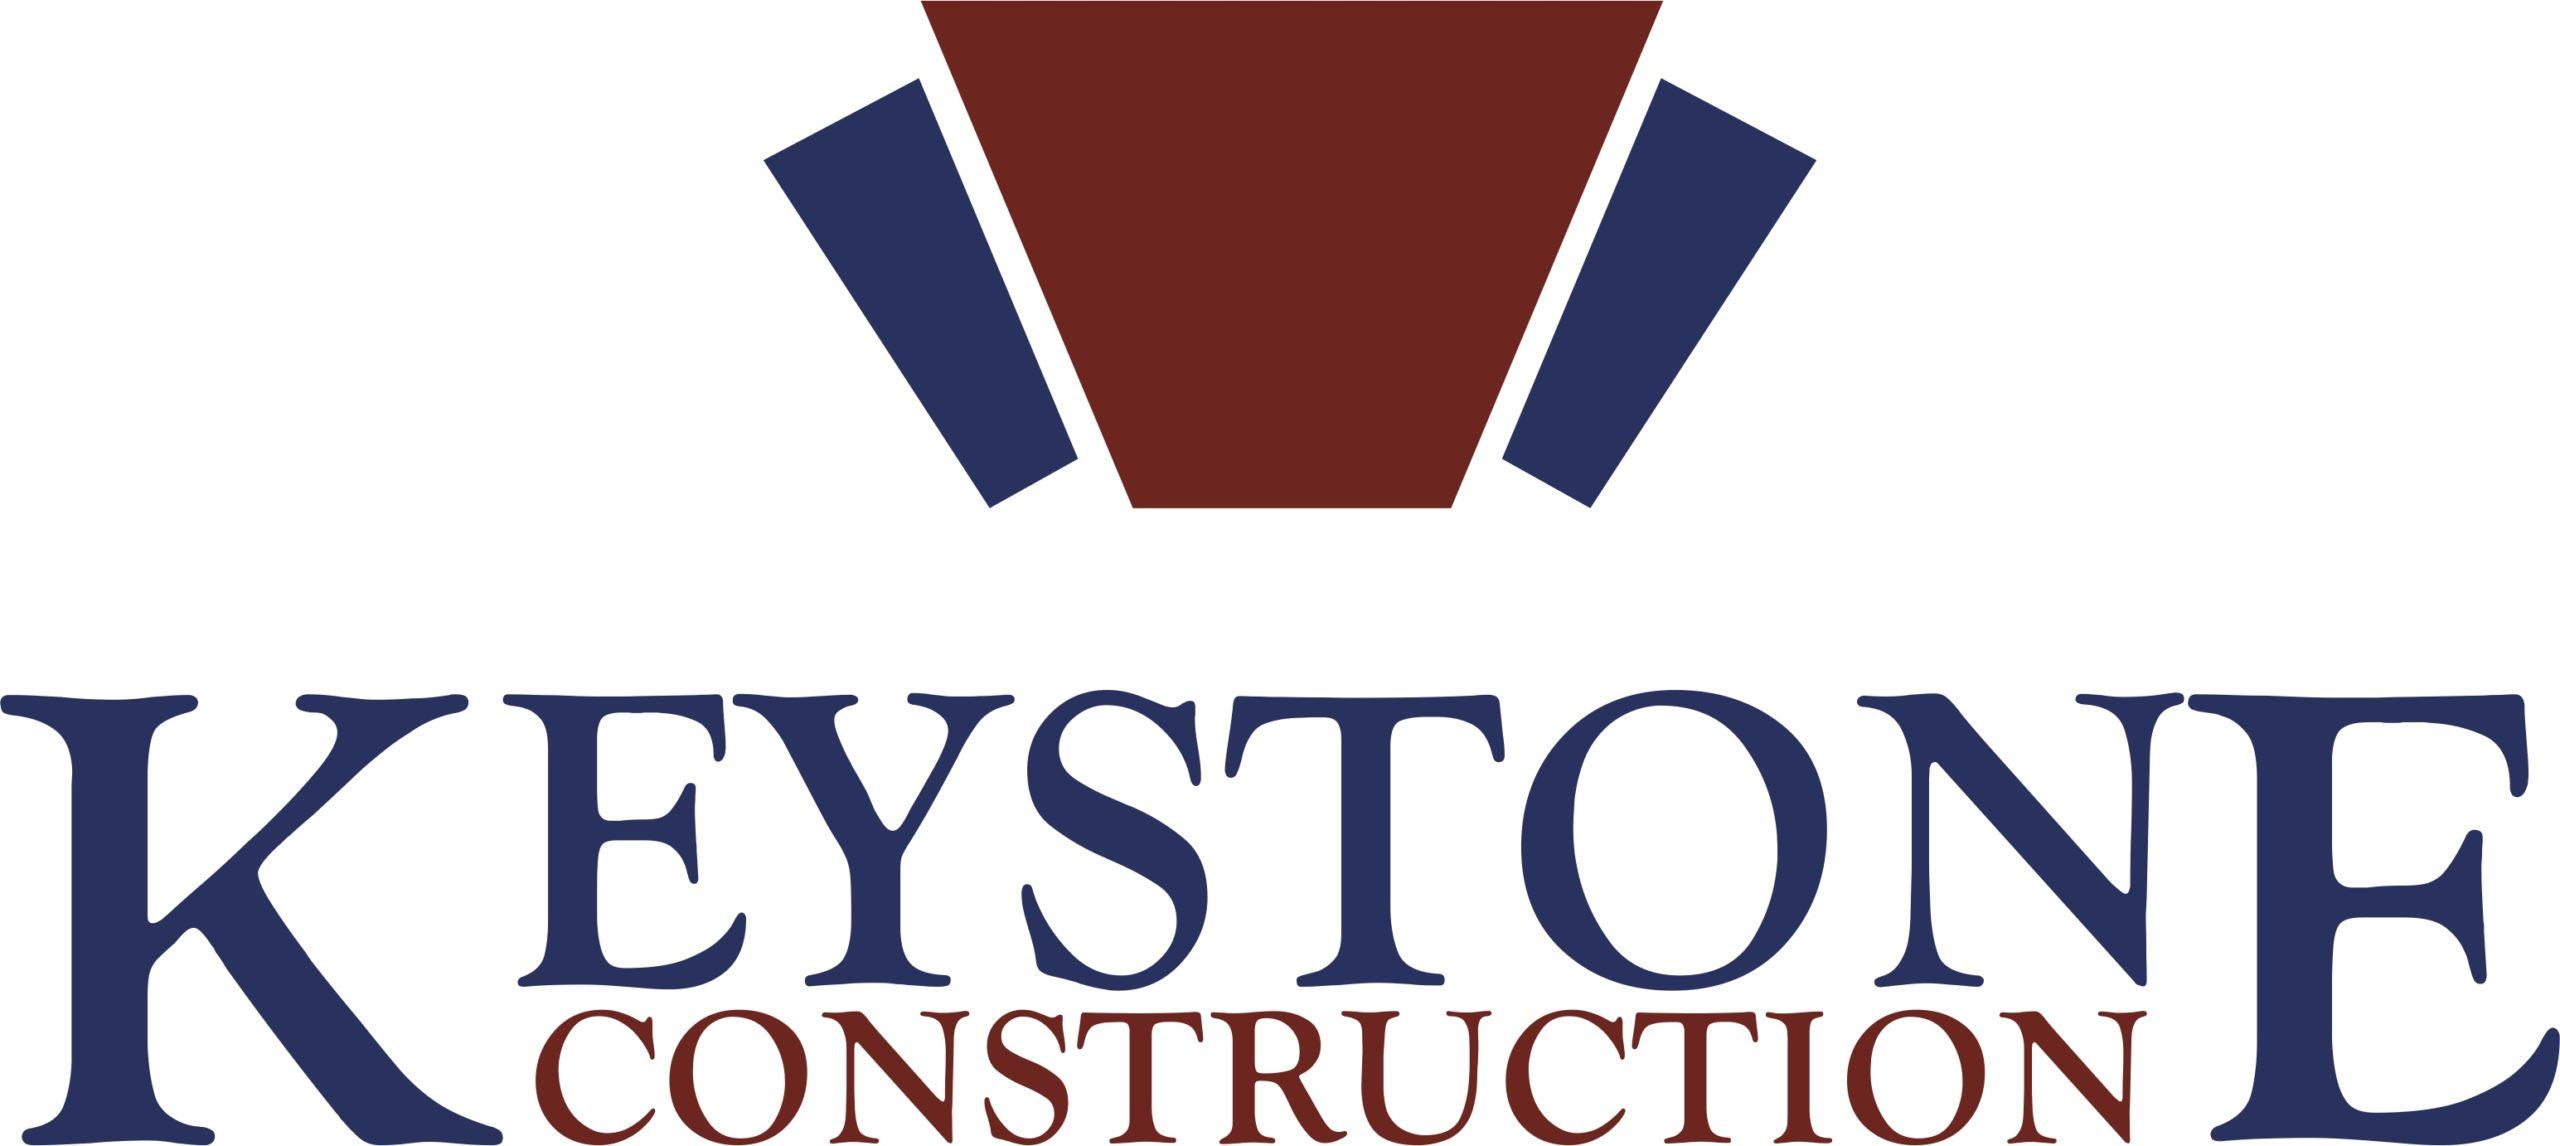 Keystone Construction